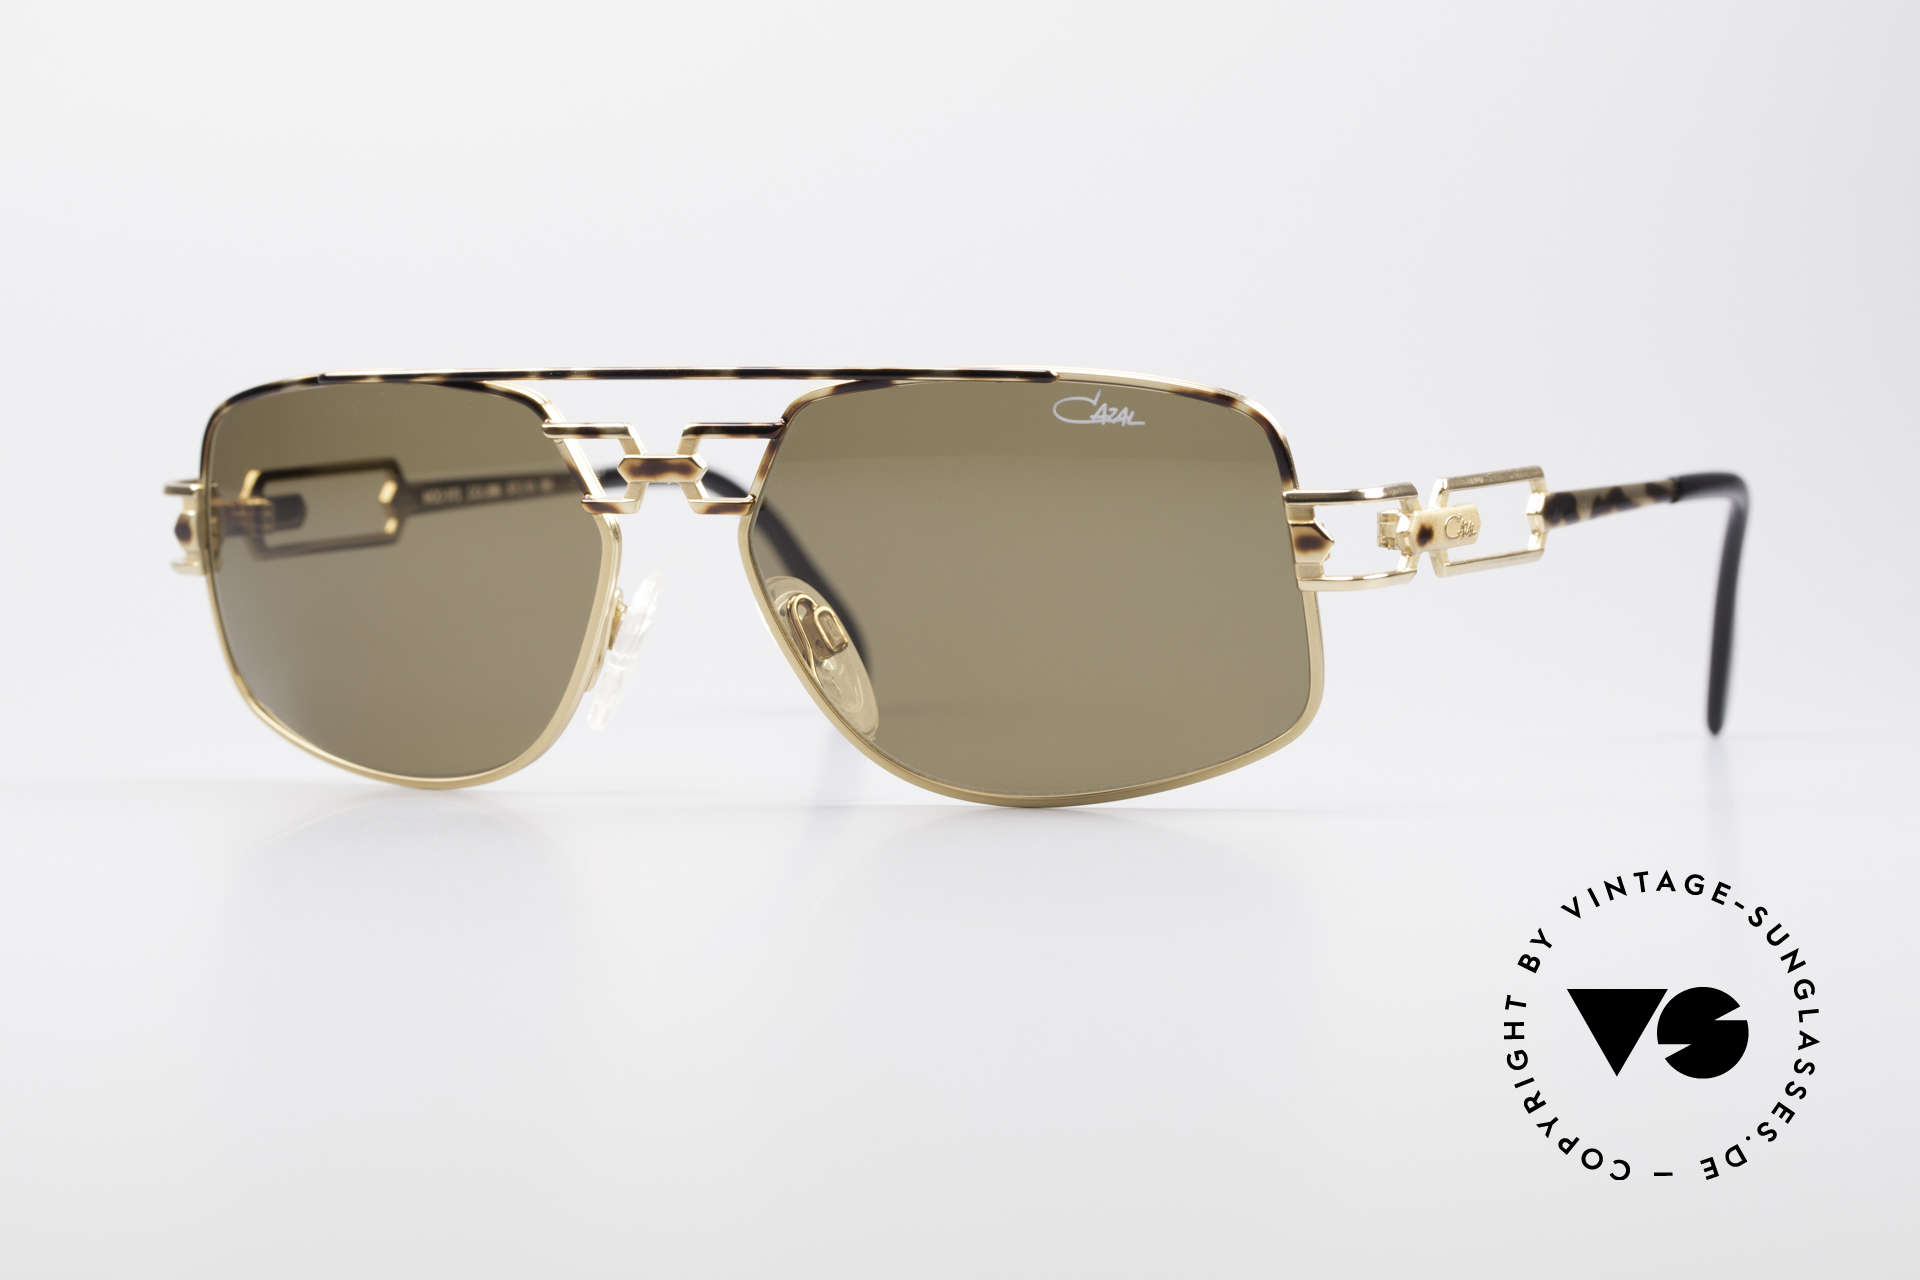 Cazal 972 Designer Sonnenbrille 90er, orig. 90er CAZAL Designer-Sonnenbrille; echt vintage!, Passend für Herren und Damen